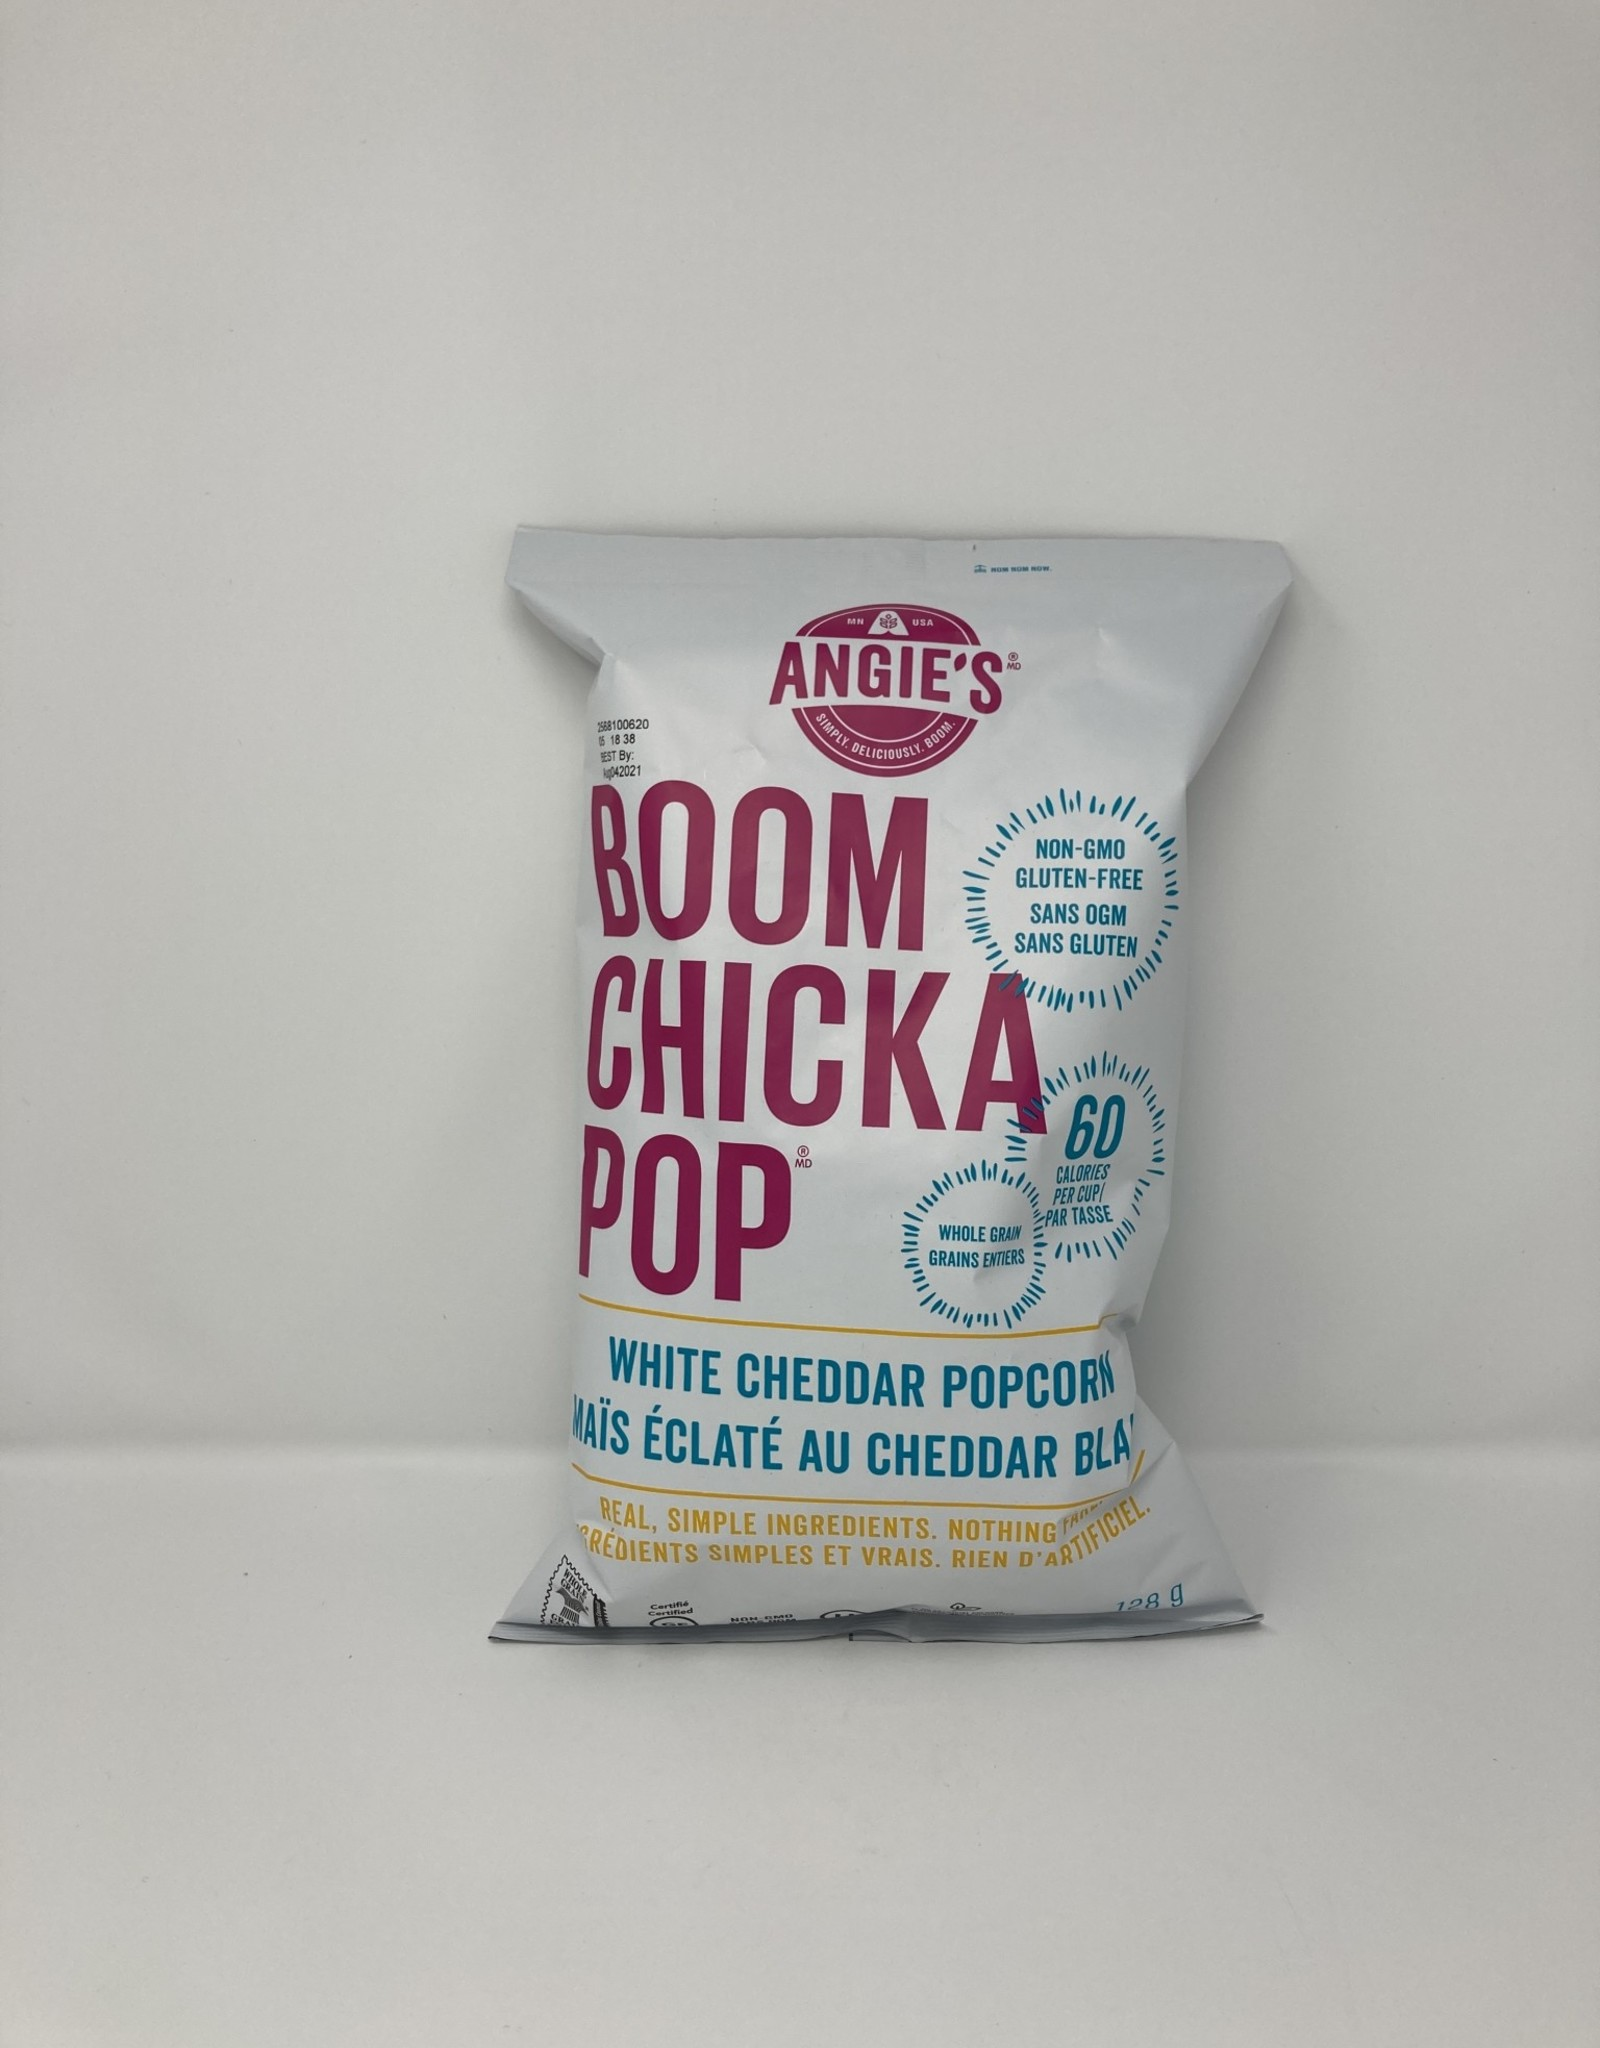 Angie's Artisan Angie's Artisan - Popcorn, White Cheddar (126g)